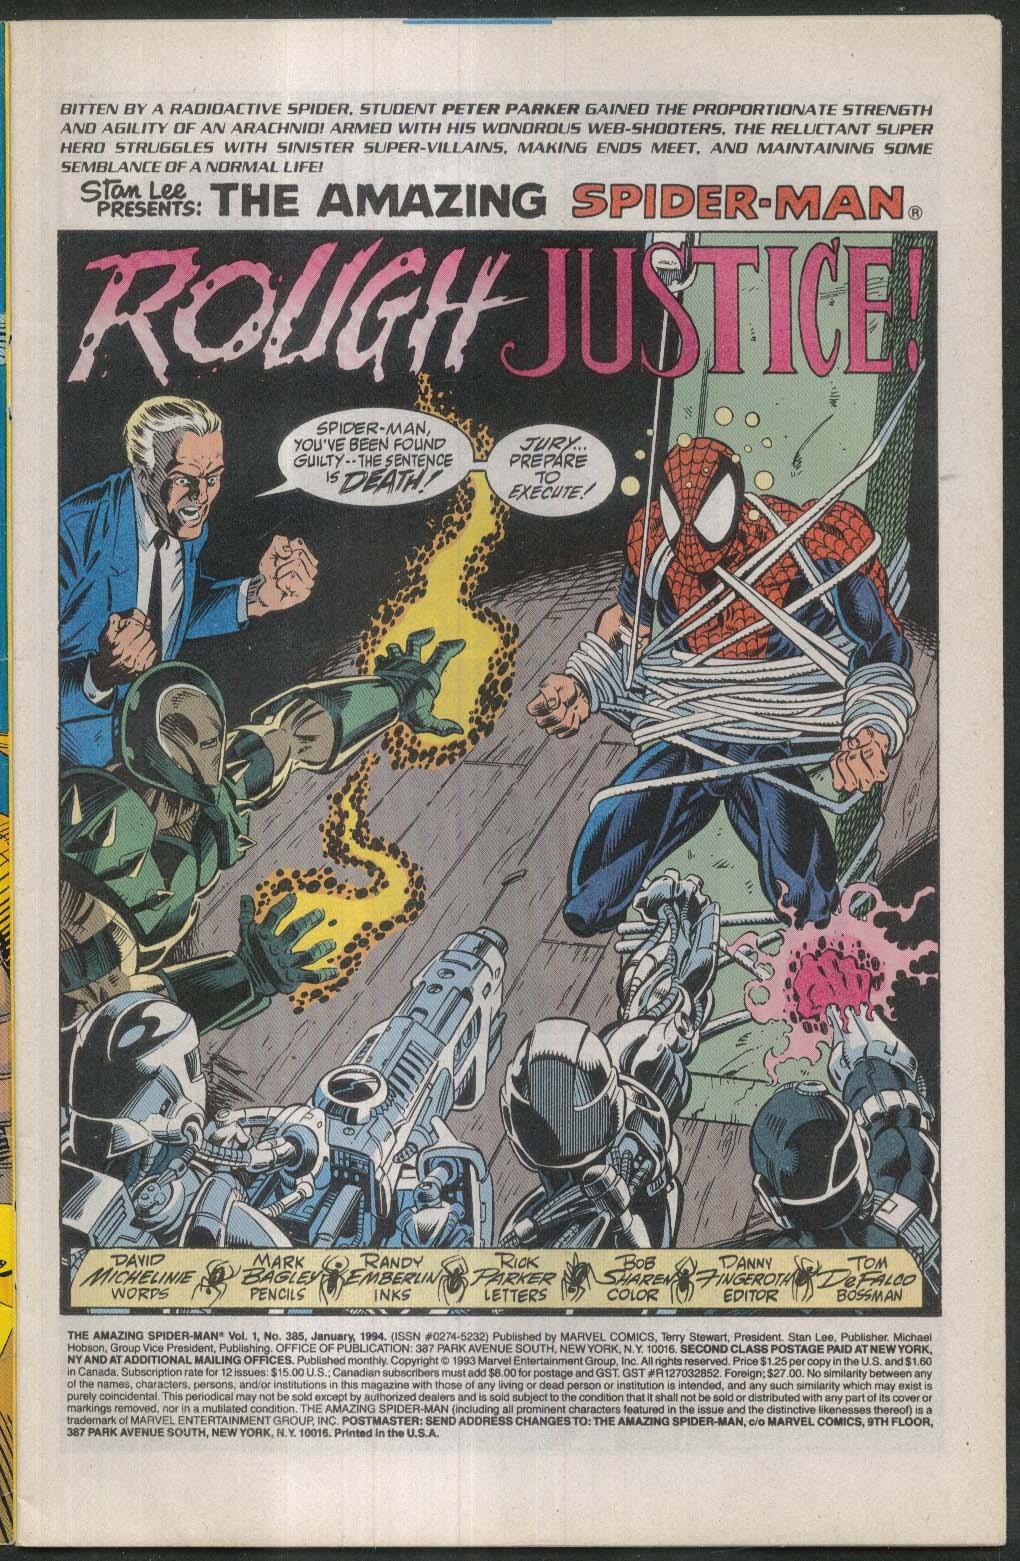 AMAZING SPIDER-MAN #385 Marvel comic book 1 1994